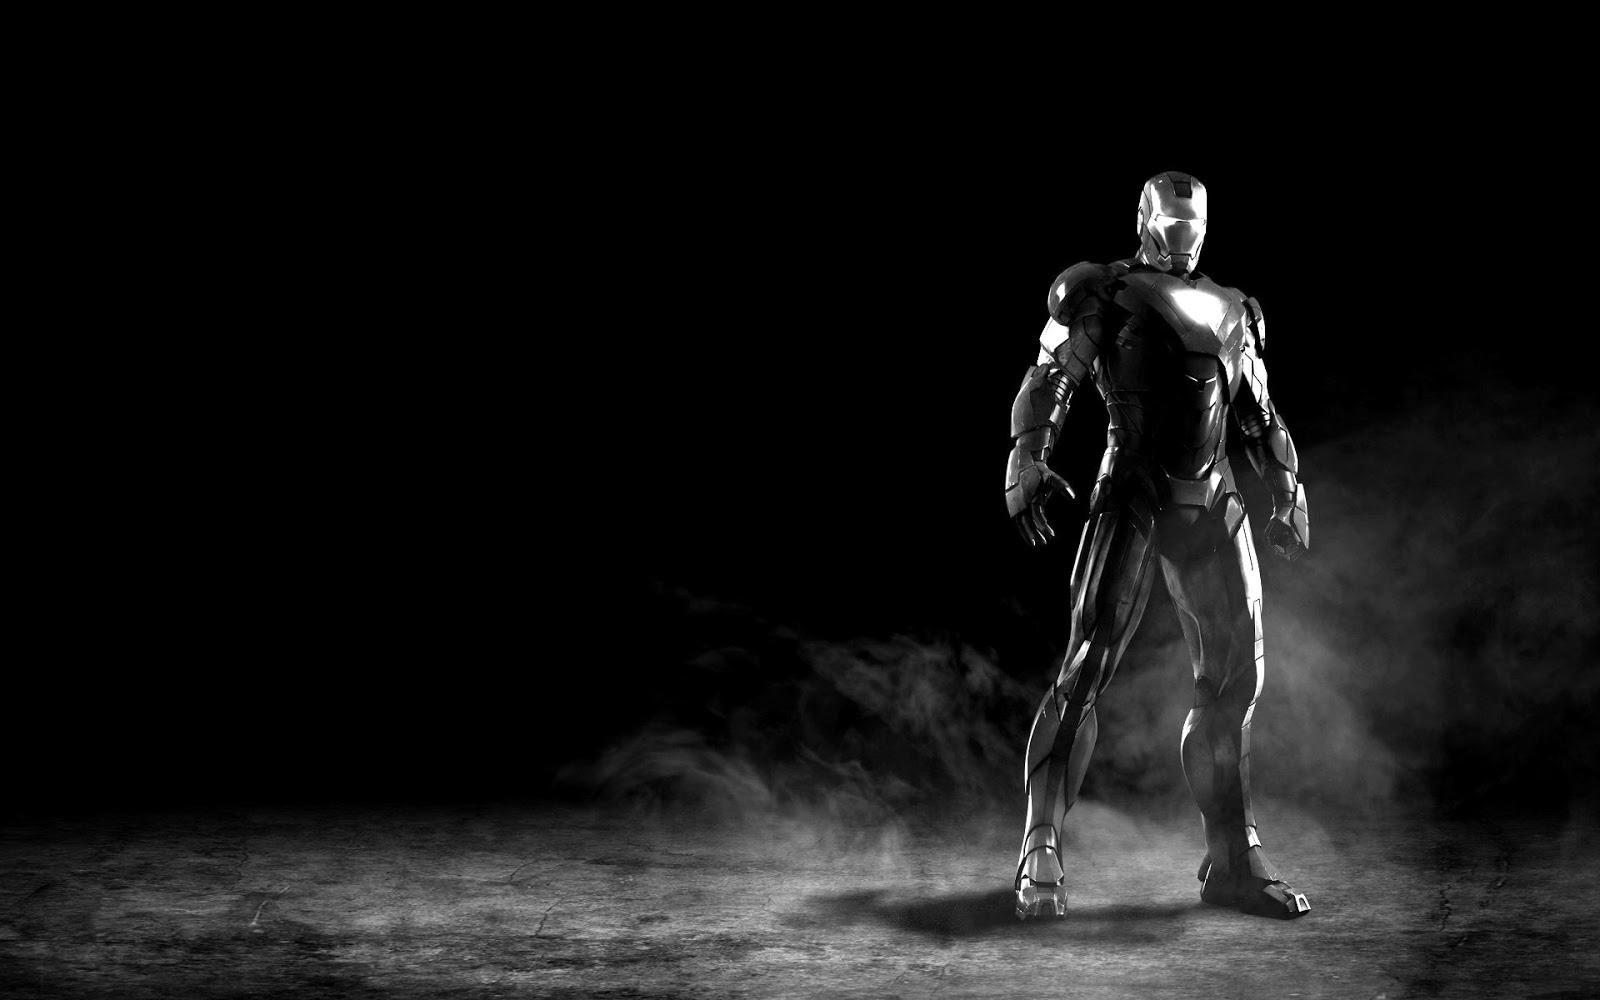 HD Iron Man 3 black and white Photo